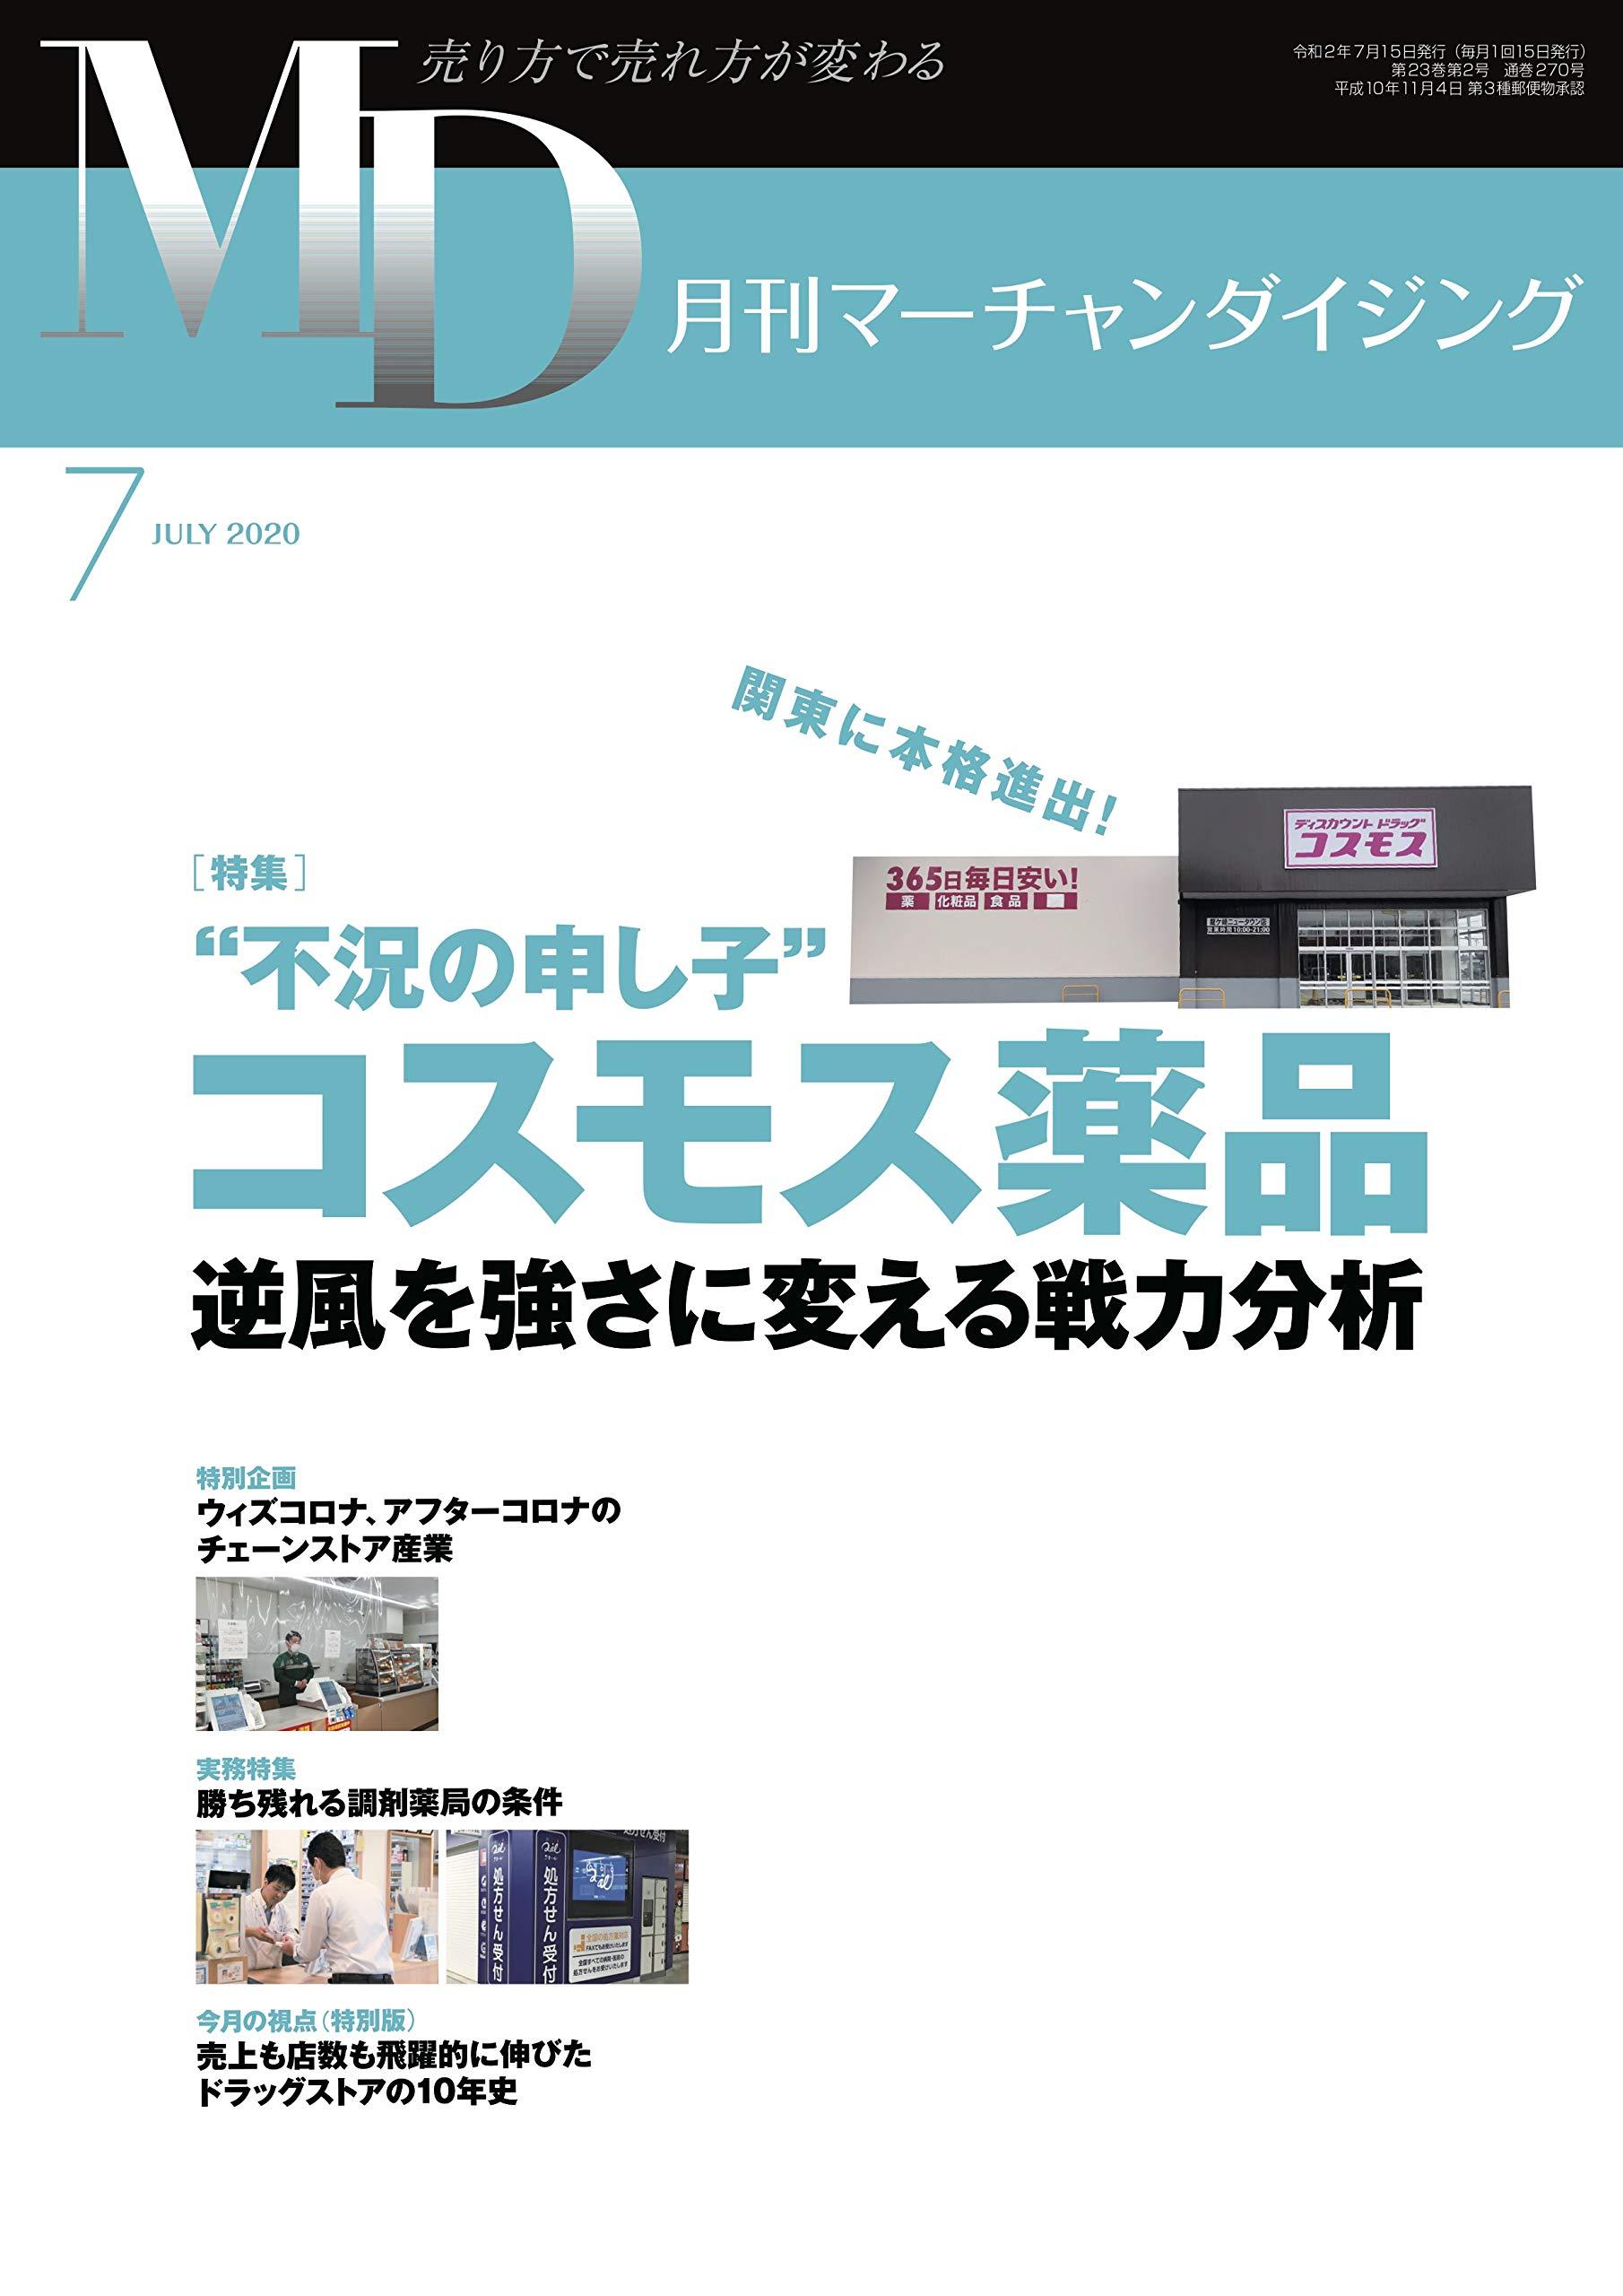 gekkanmahchandaijingunisennijunenshitsugatsugo (Japanese Edition)